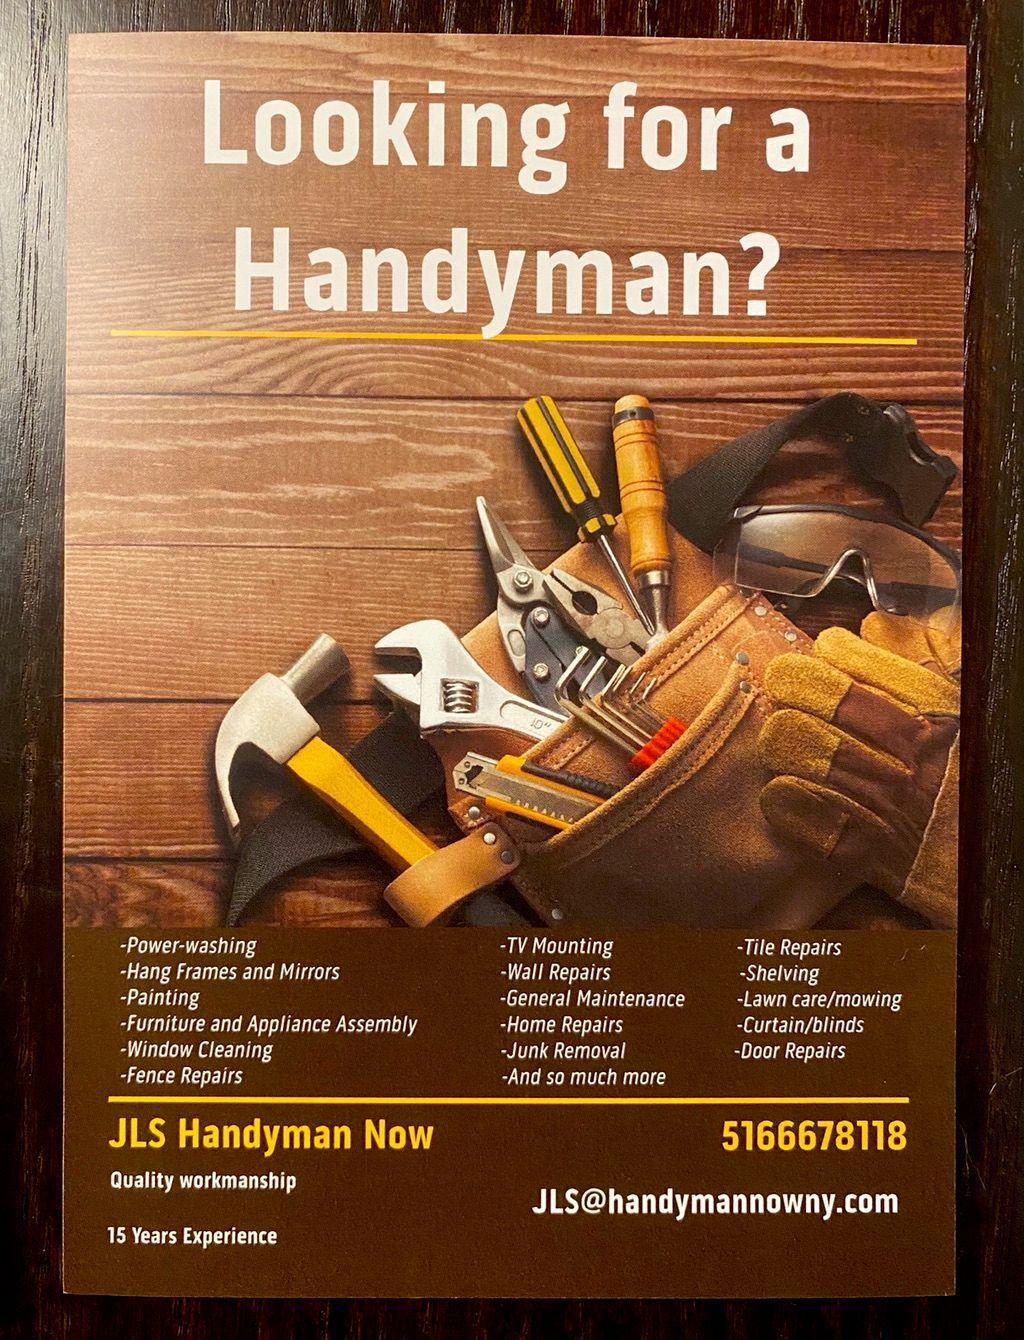 JLS Handyman Now NY